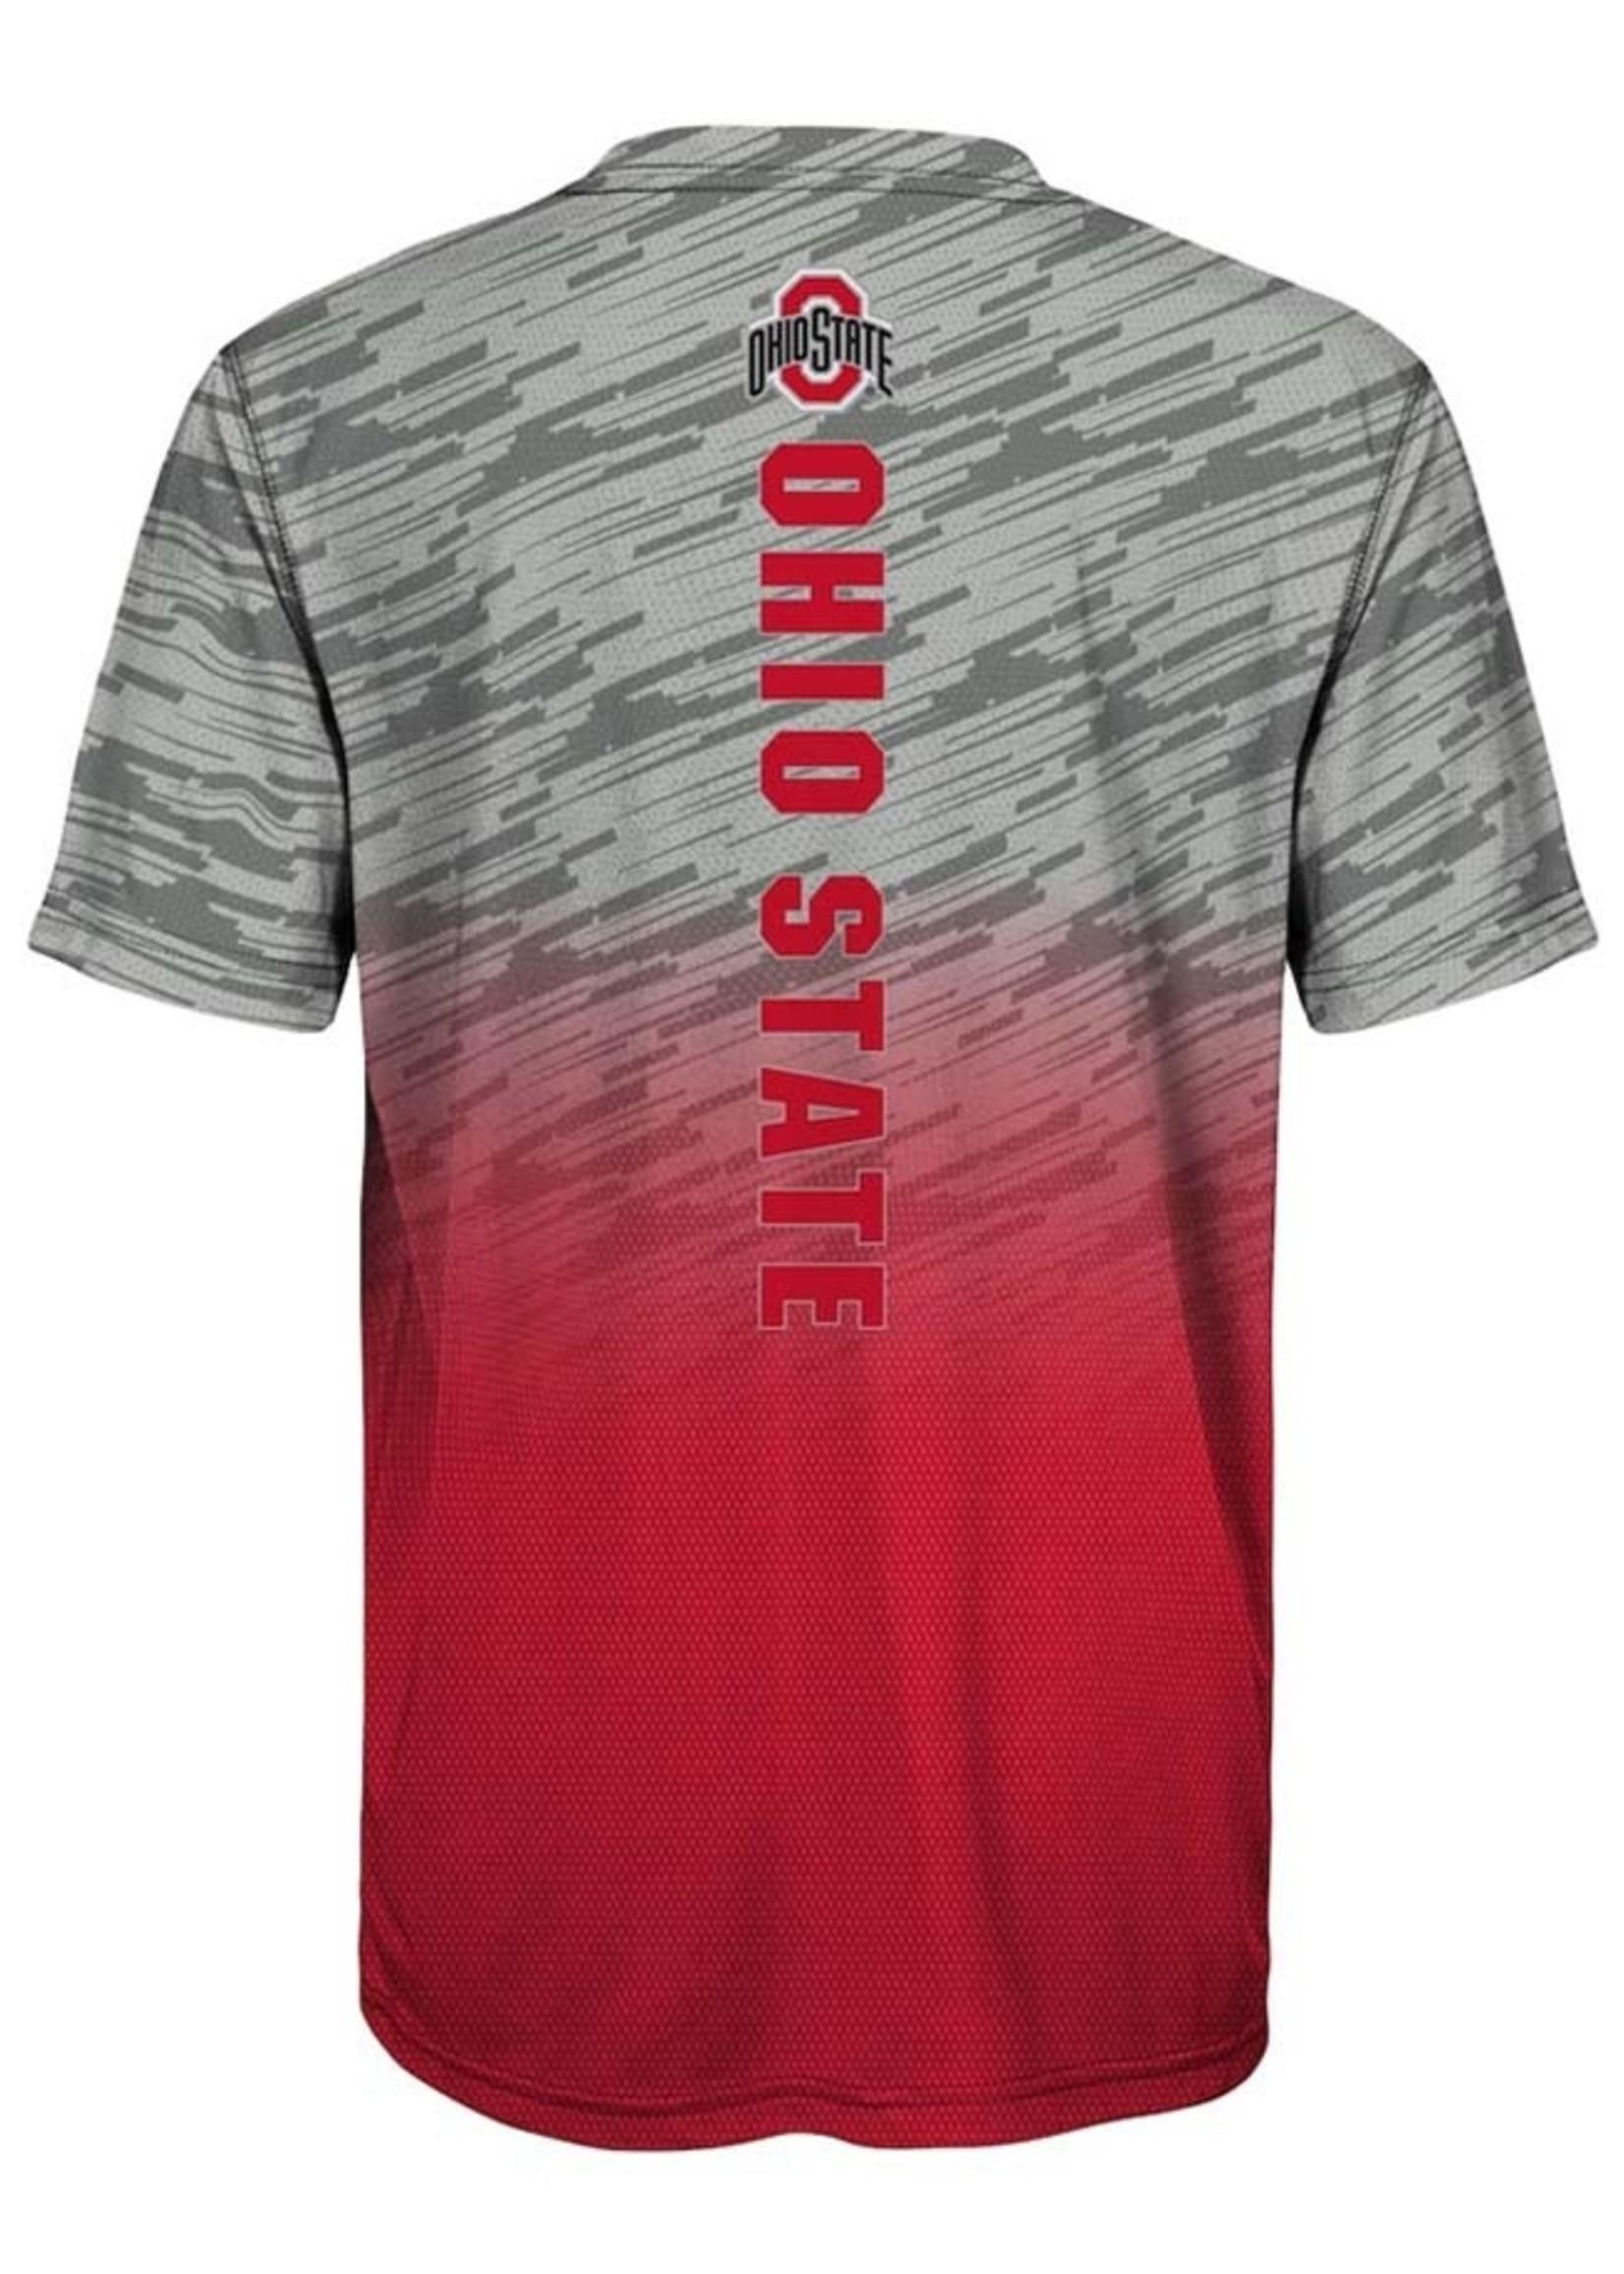 Ohio State Buckeyes Youth Gray/Scarlet Stadium Gradient T-Shirt